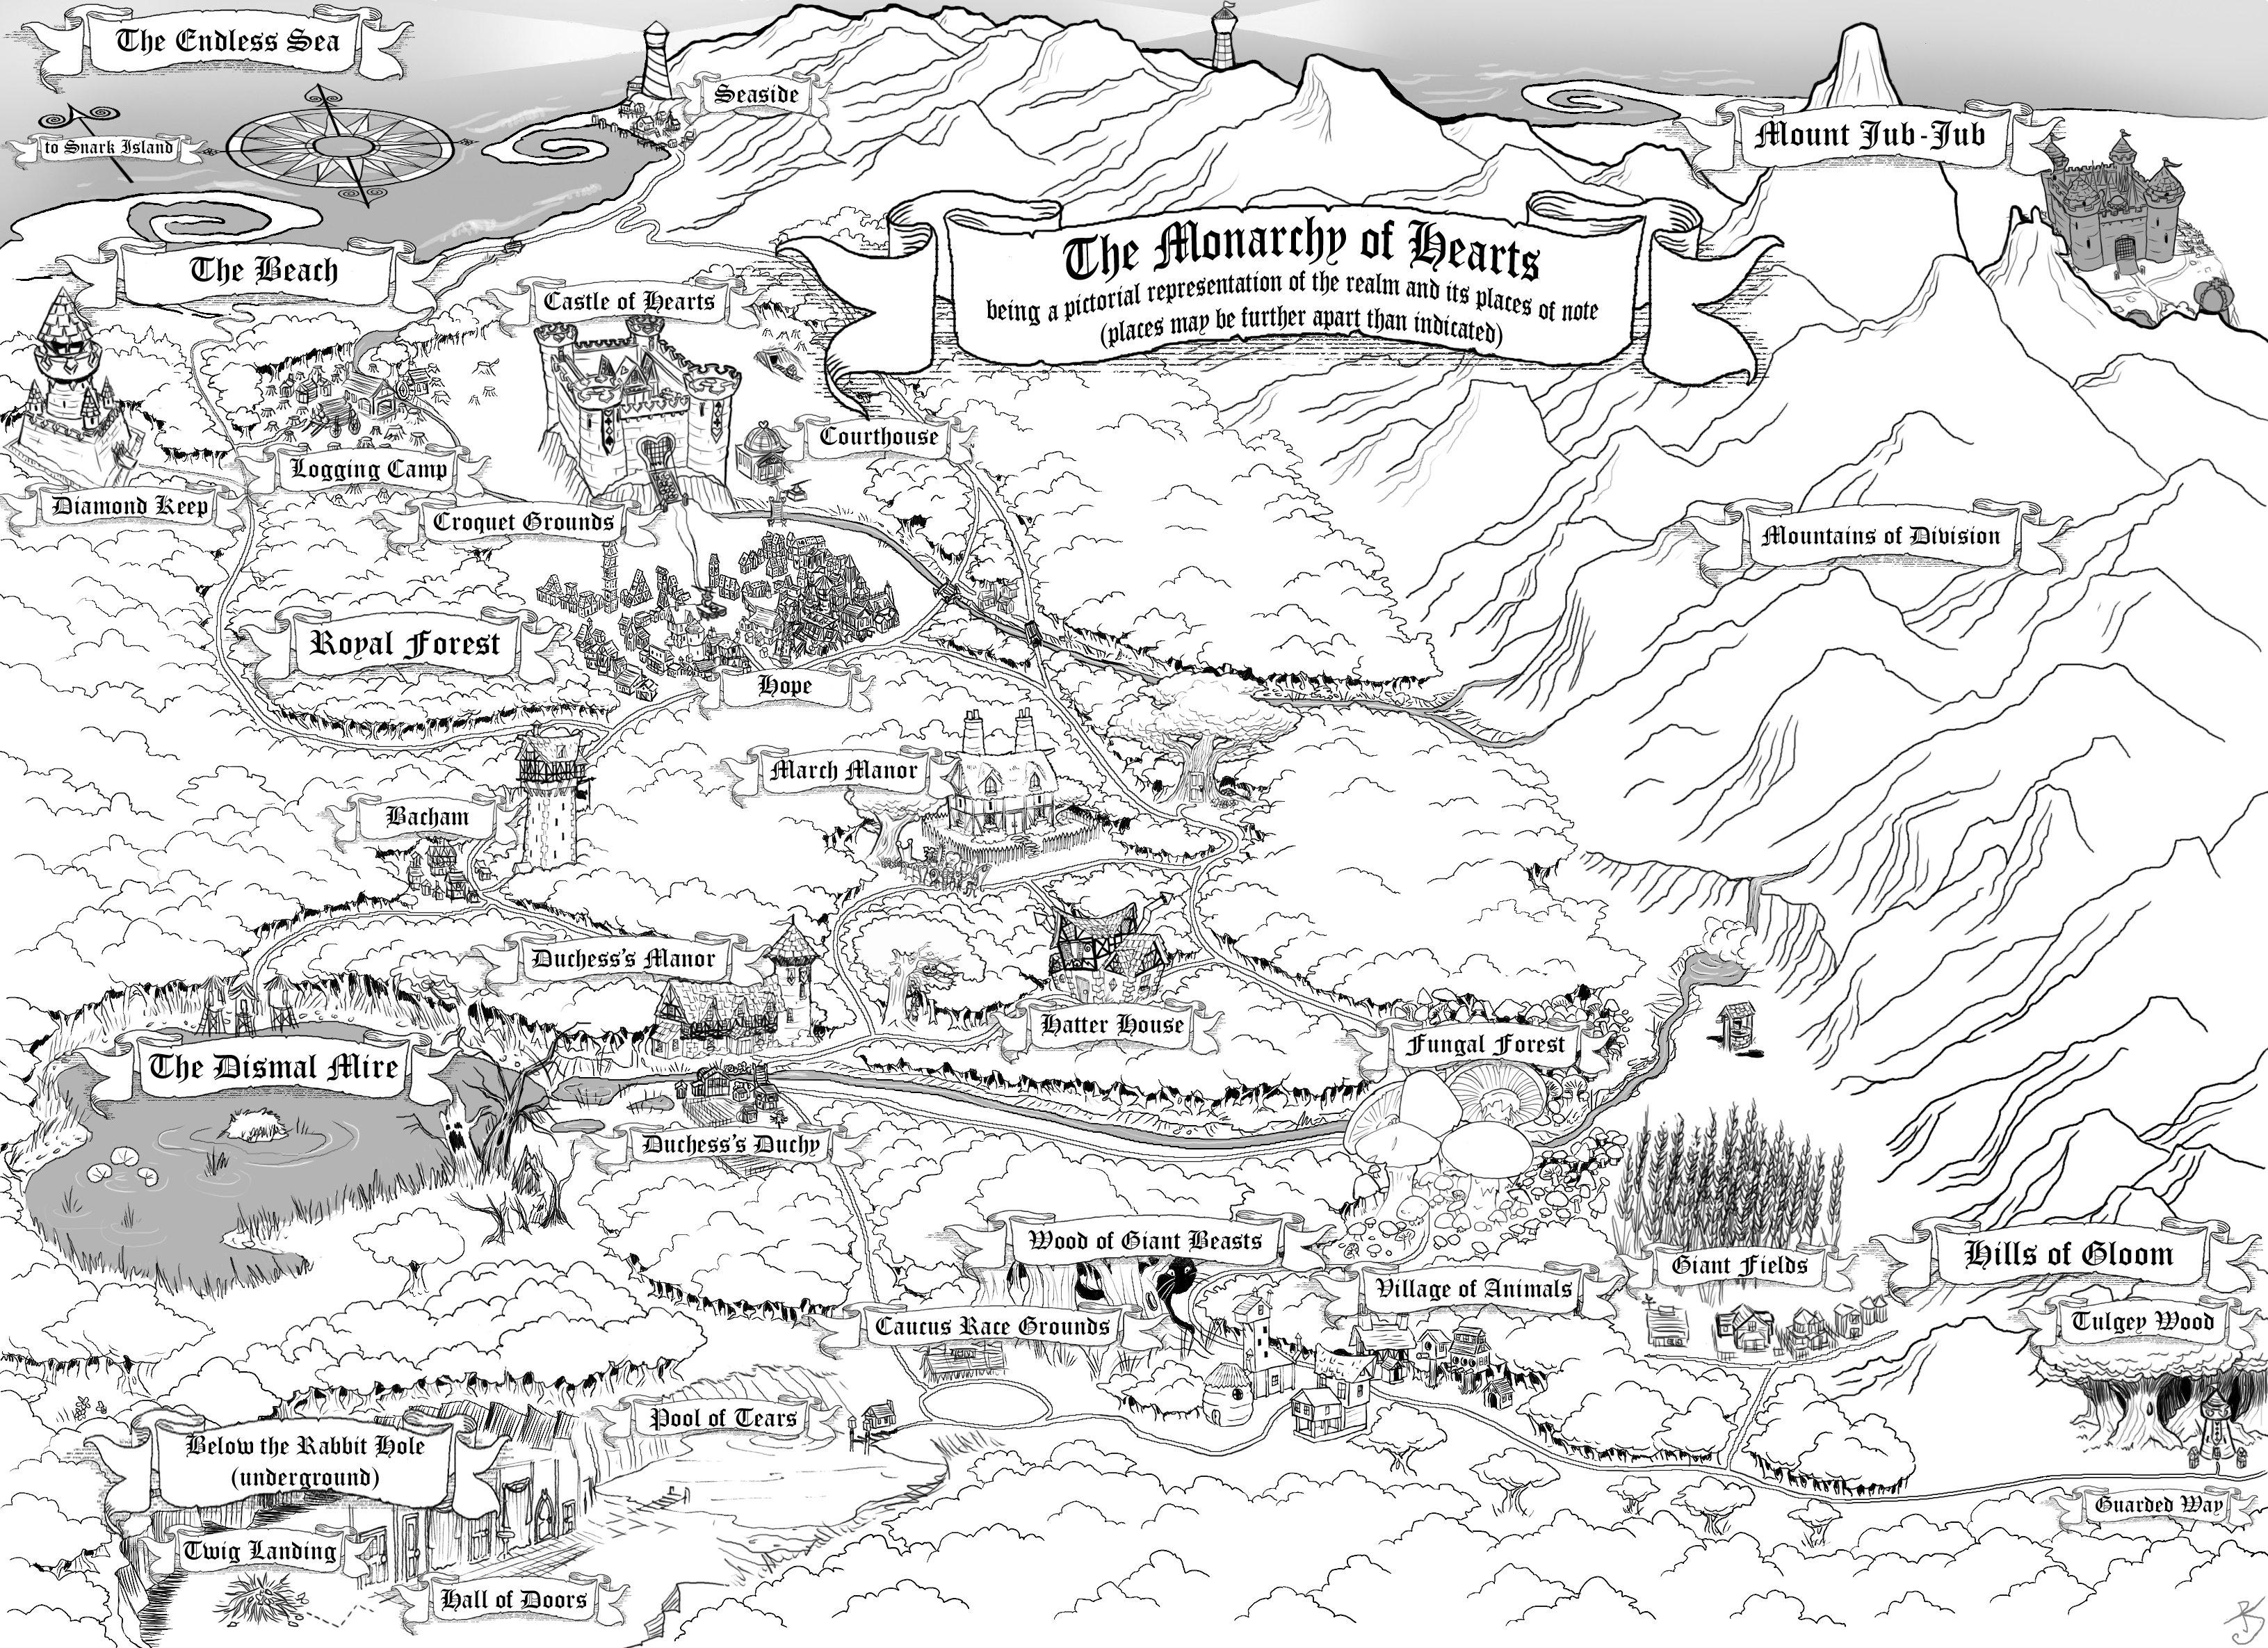 Huckleberry Finn Map Of Journey